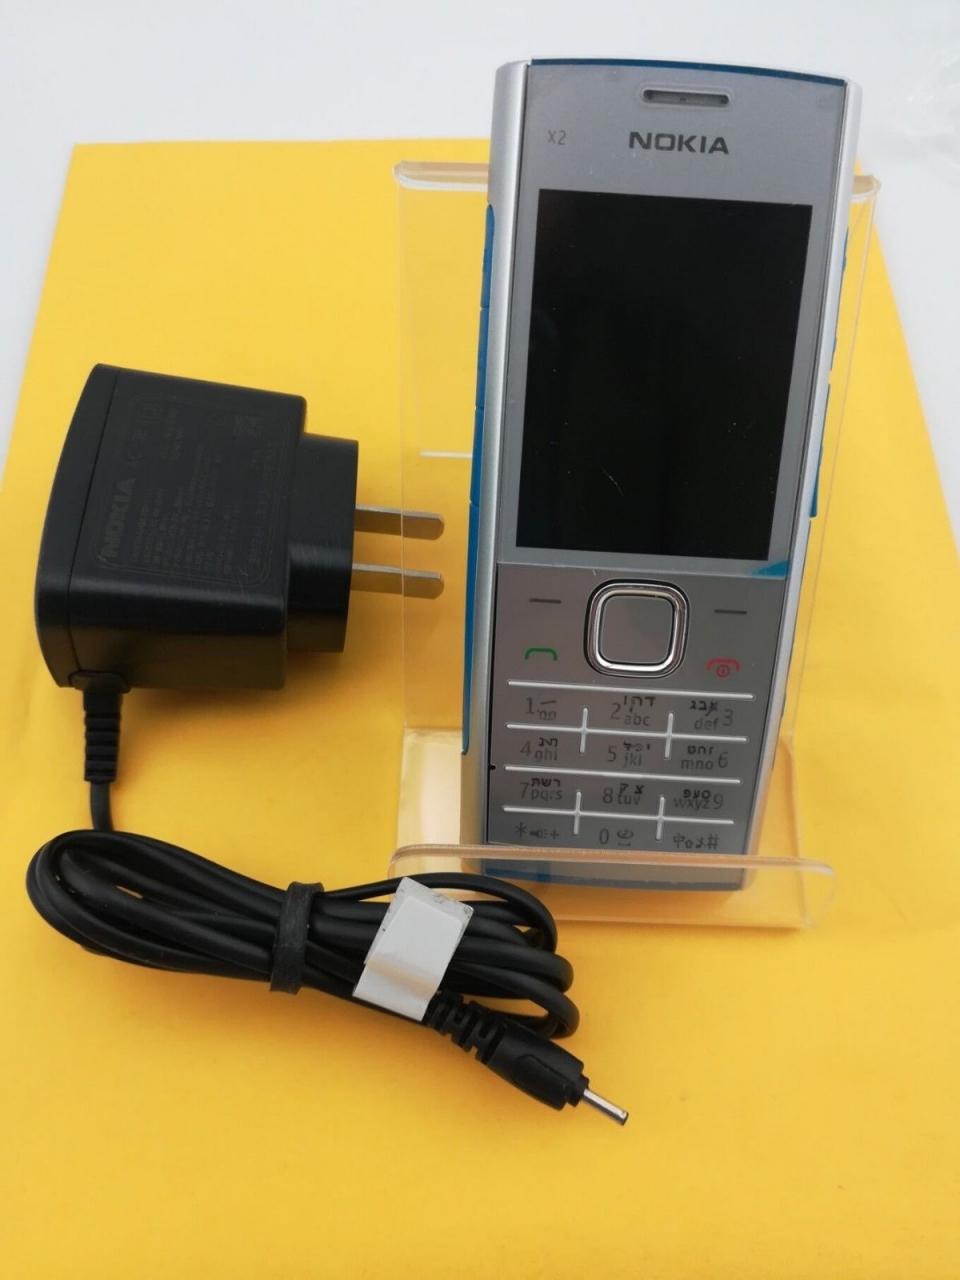 Refurbished phone Nokia X2-00 Bluetooth FM JAVA 5MP Cell Phones Free Shipping black 10